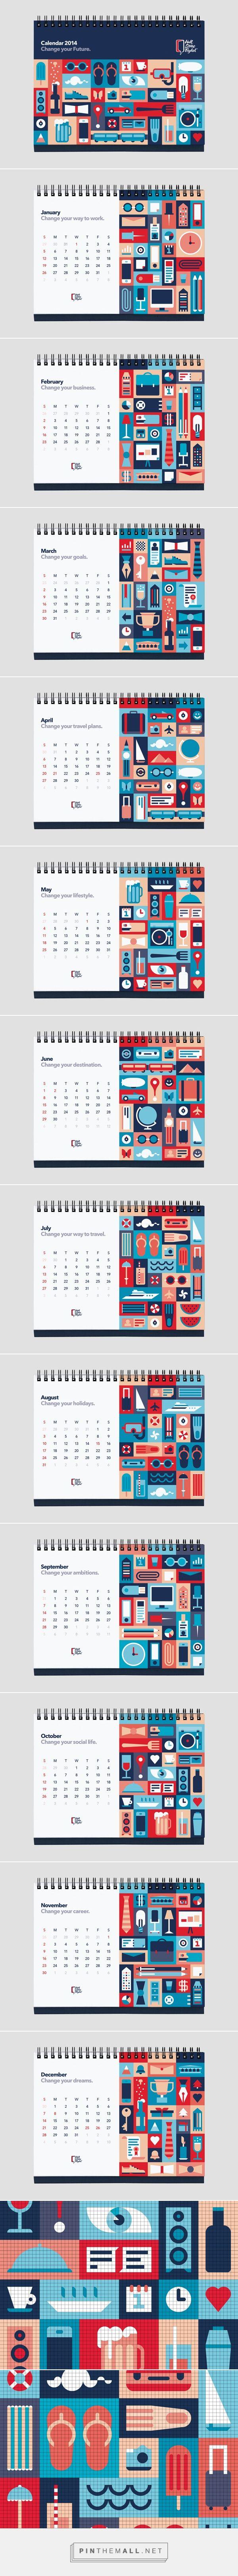 Wall Street English Calendar 2014